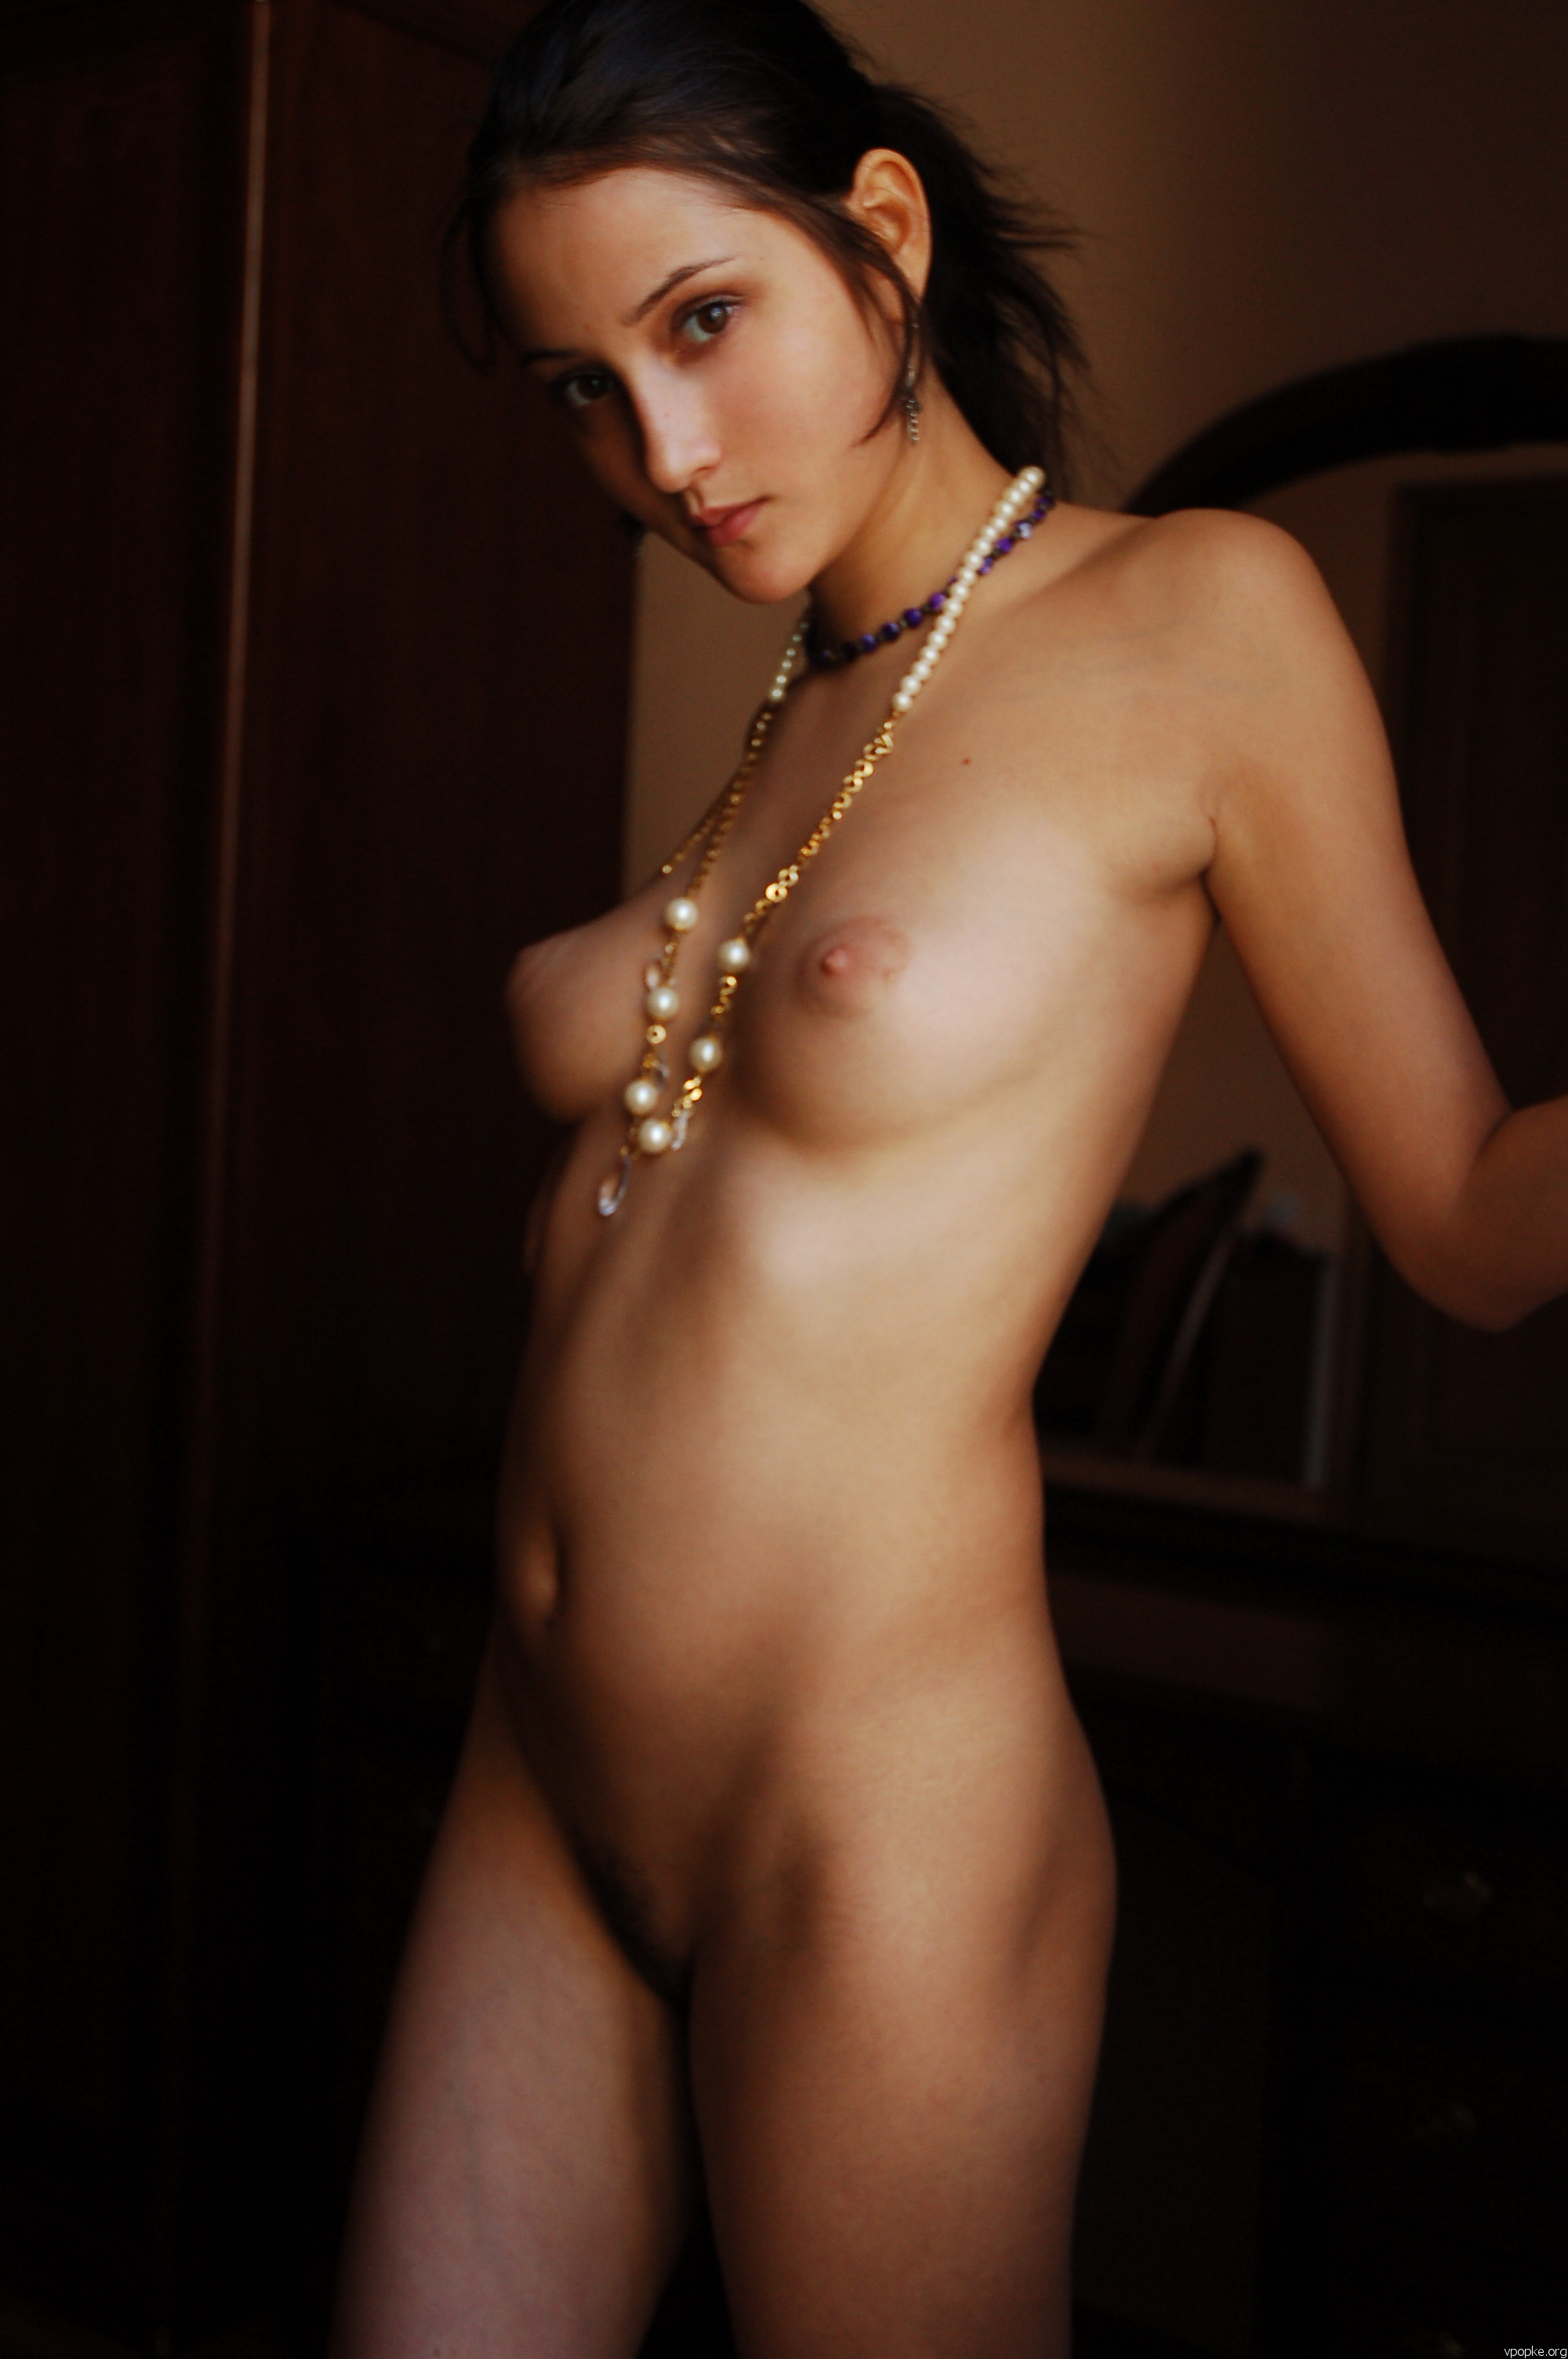 https://boobsmo.com/content/167/boobsmo_com_0000__24.jpg